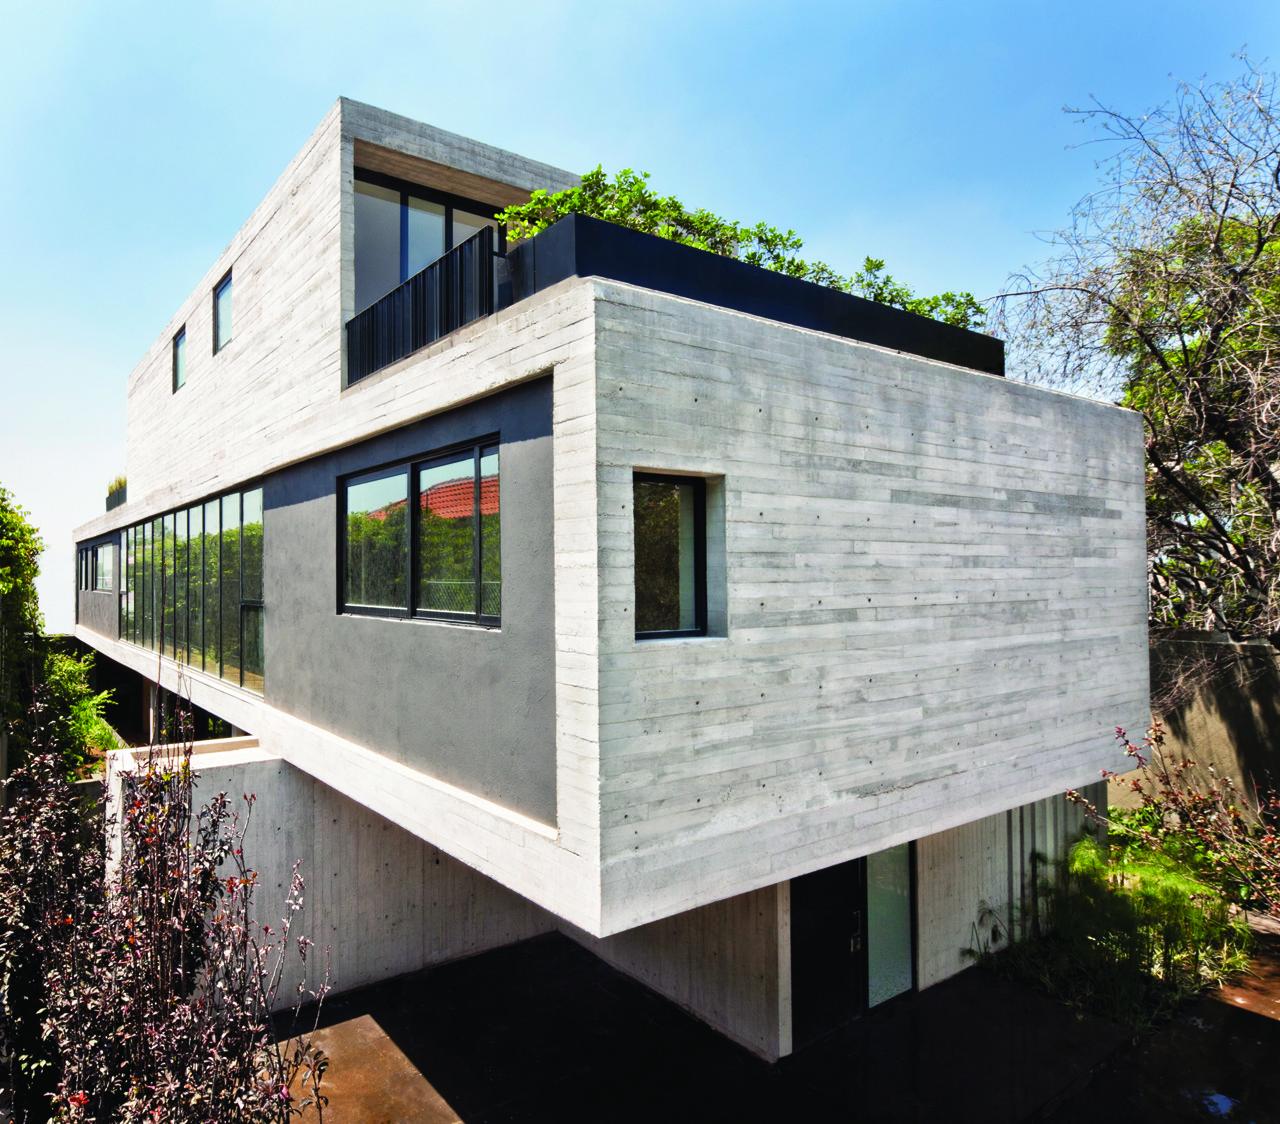 Archivo viviendas unifamiliares en m xico plataforma for Viviendas sobre terrazas